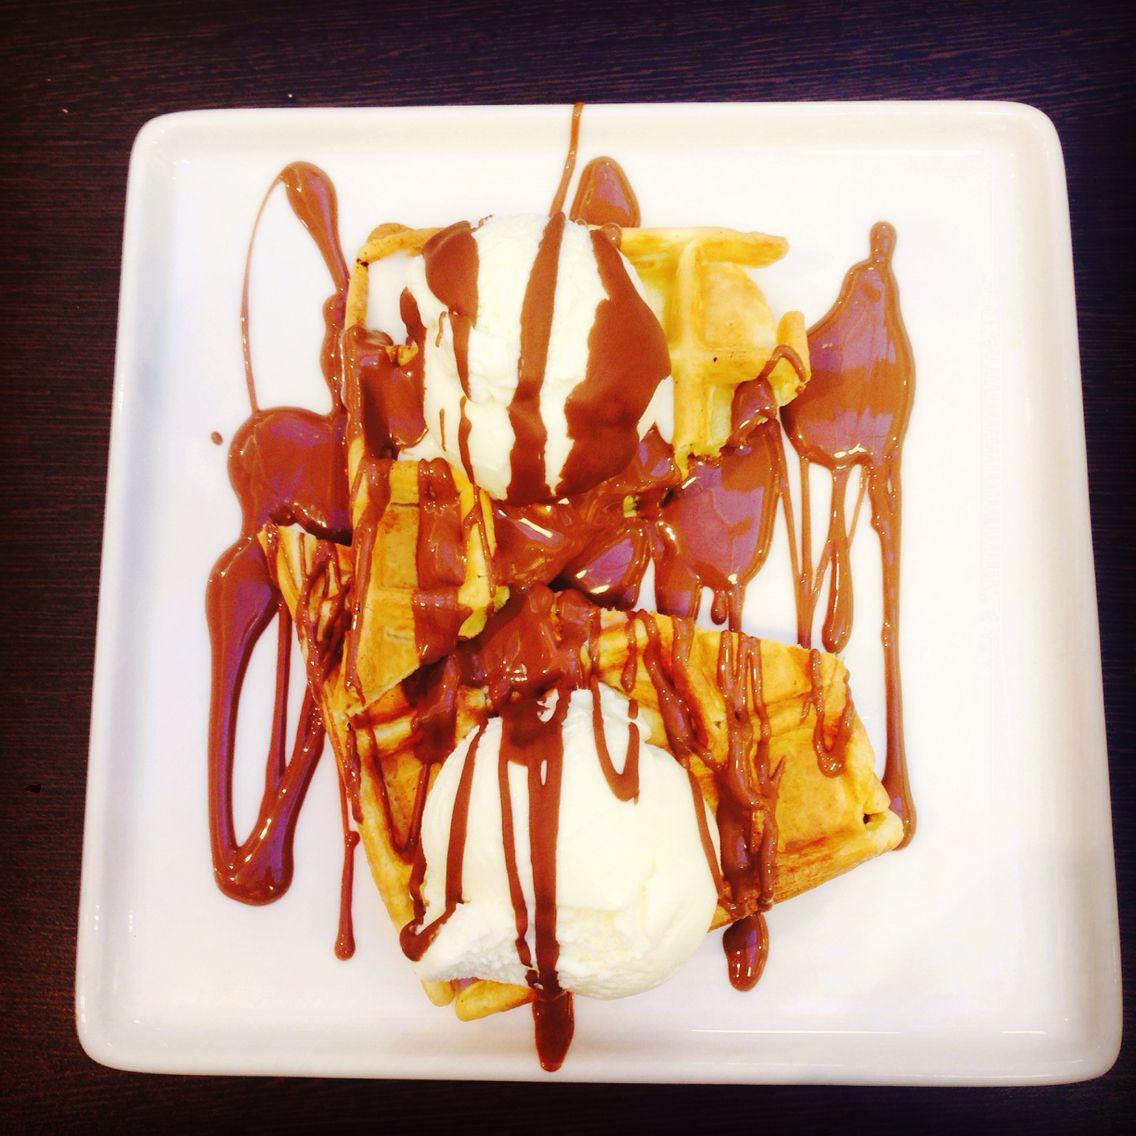 Icecream and waffles